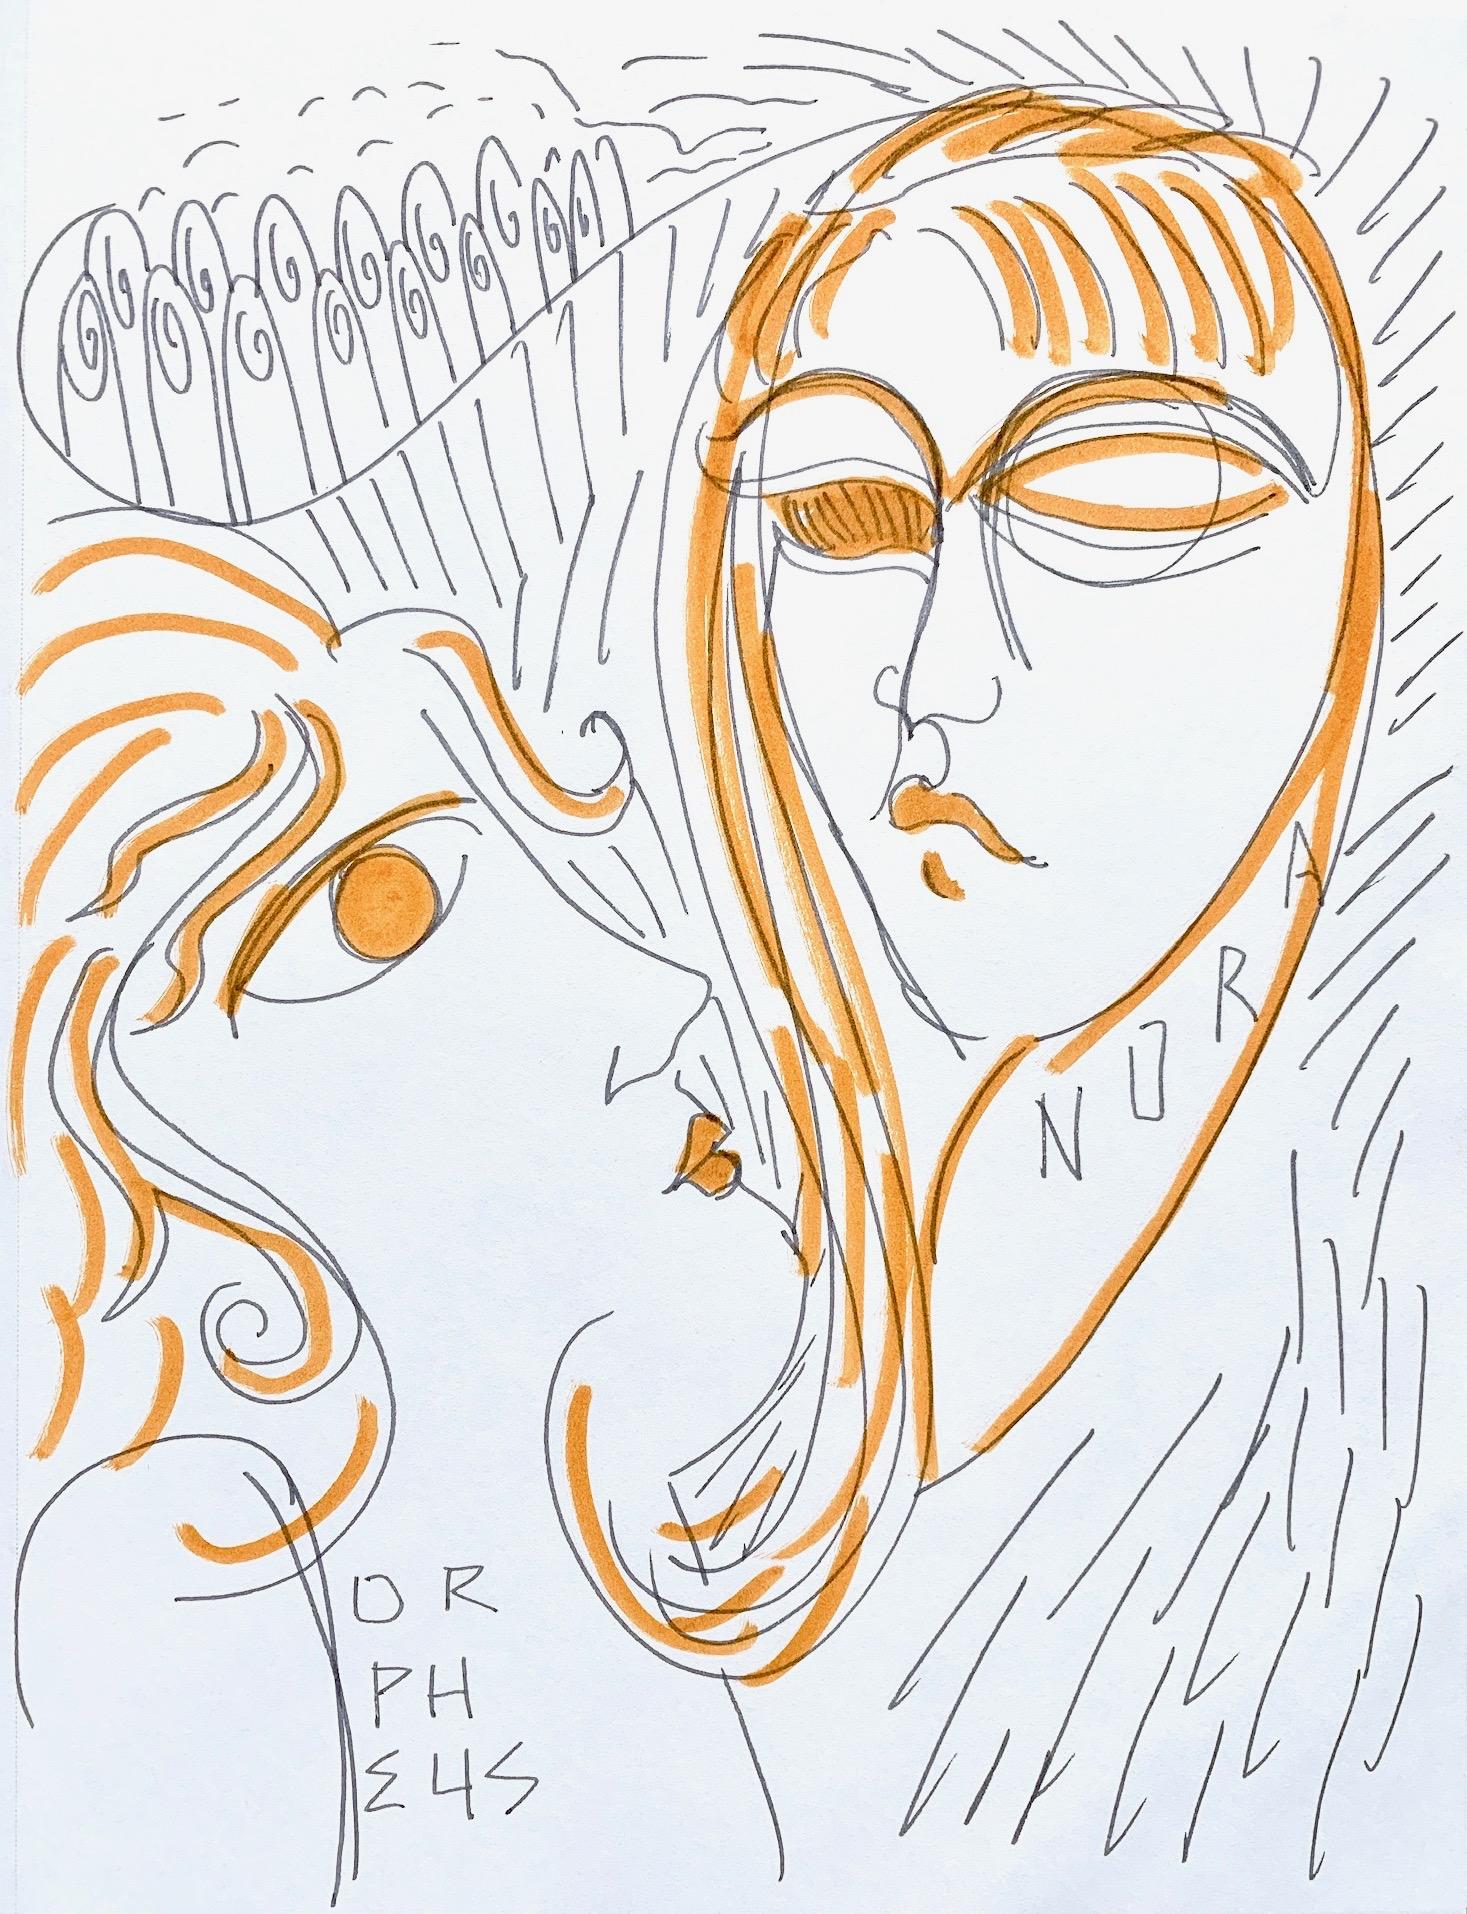 Orpheus & Nora (After Rilke), II